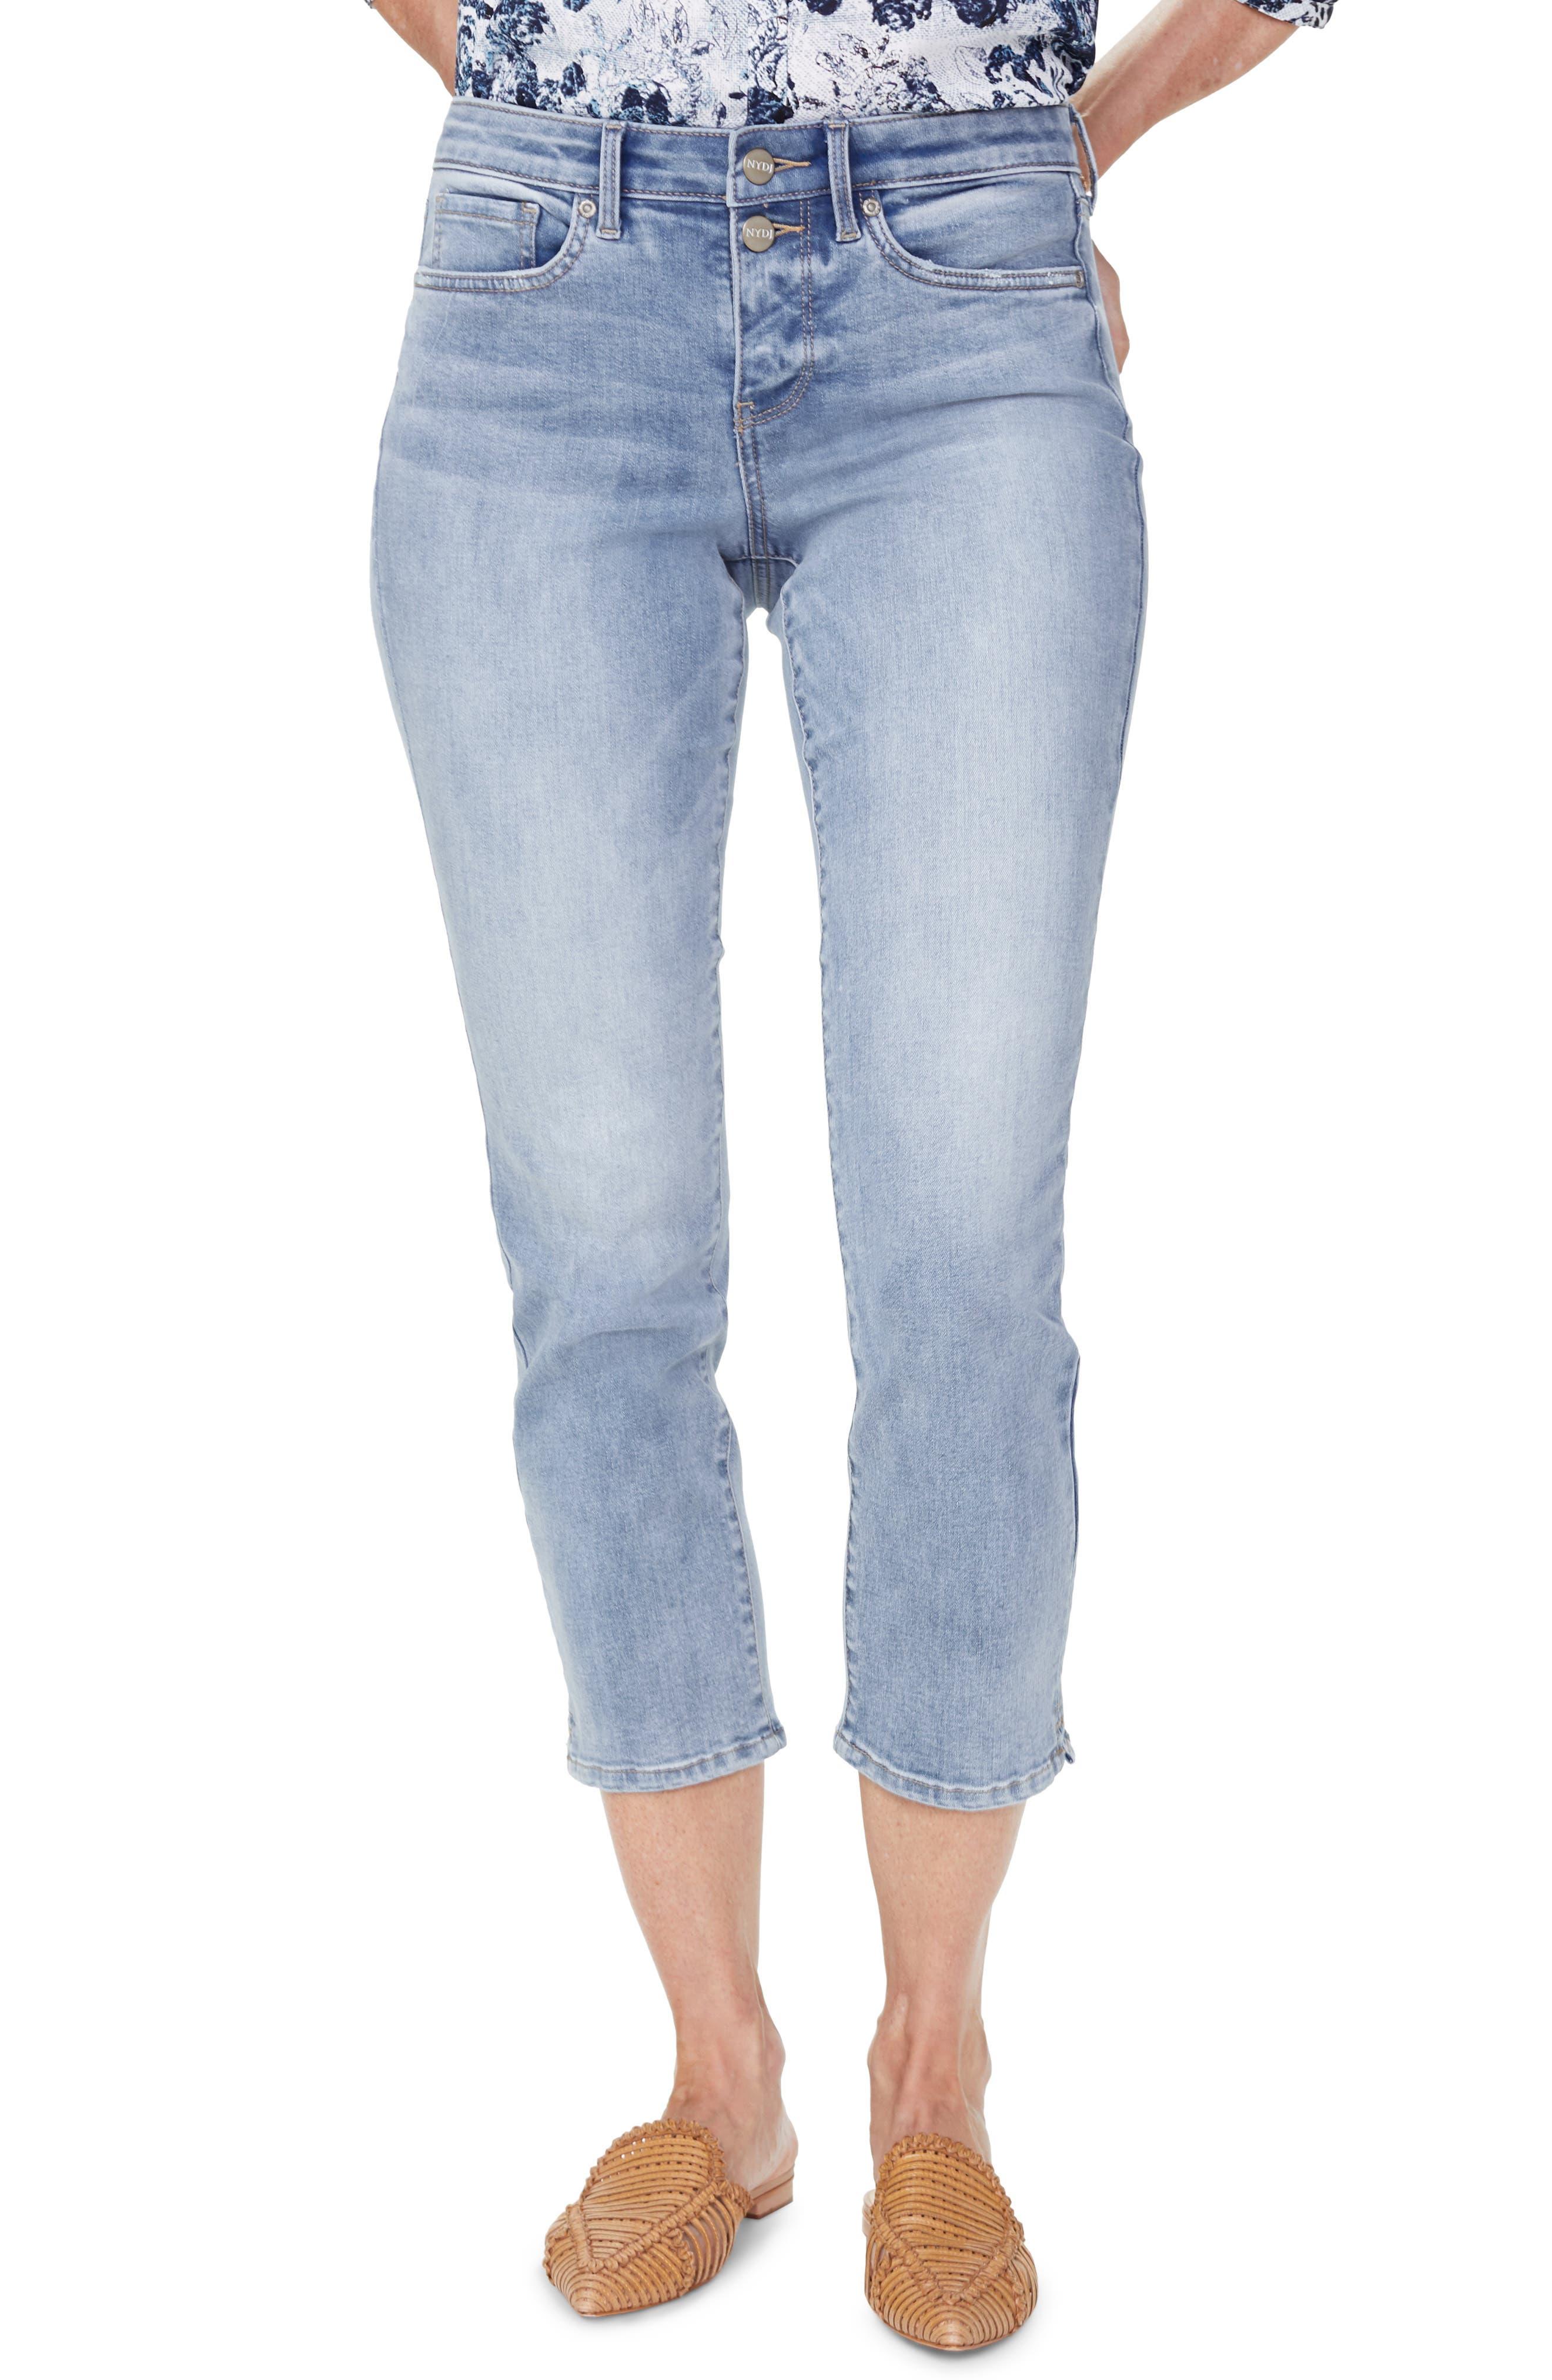 Image of NYDJ Sheri Stretch Ankle Jeans